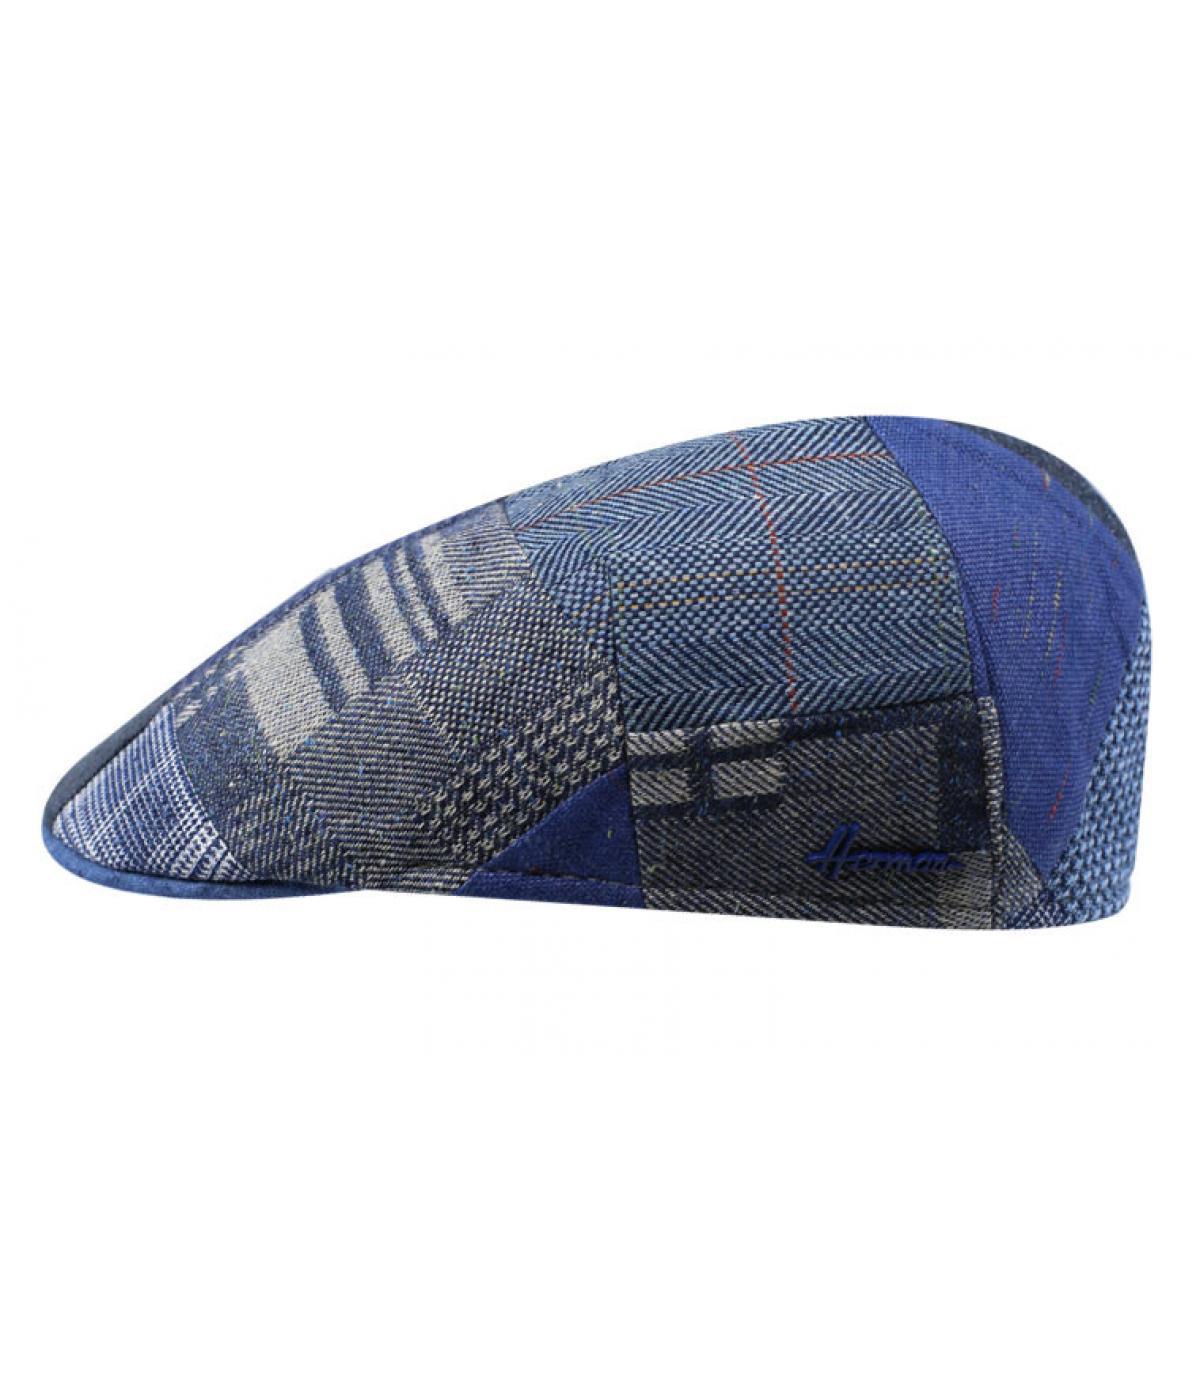 Dettagli Botnie Patch blue - image 2